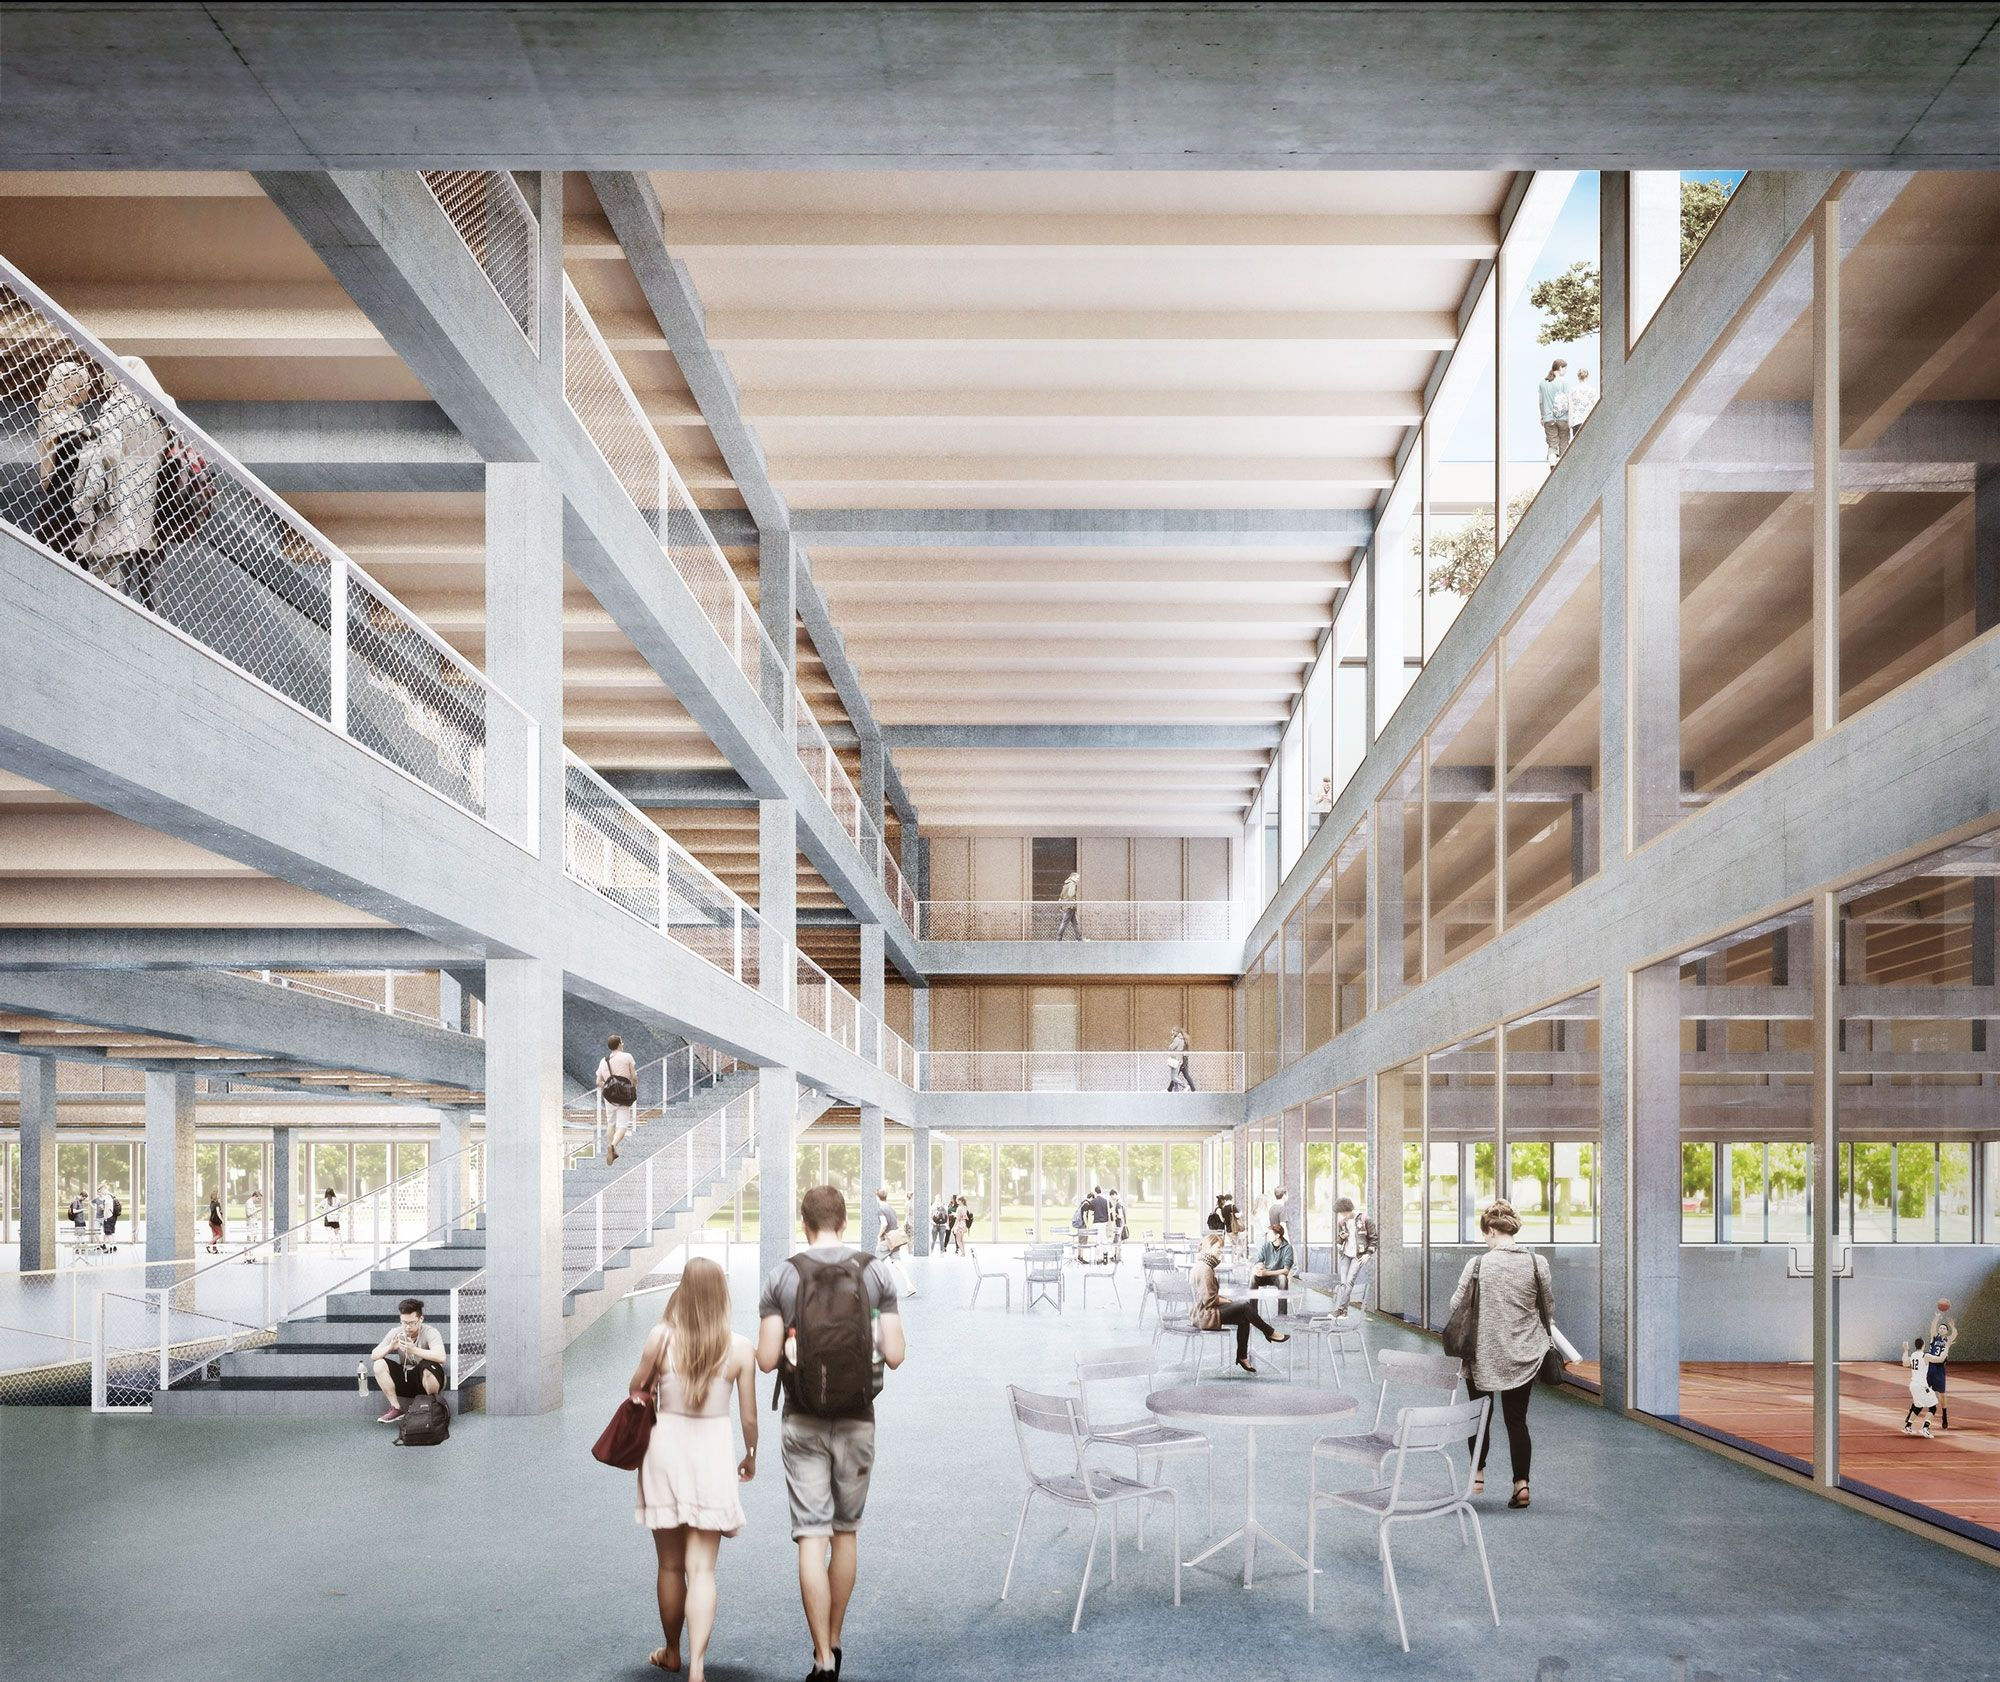 1 preis zur weiterbearbeitung empfohlen perspektive for Innenraum design berlin